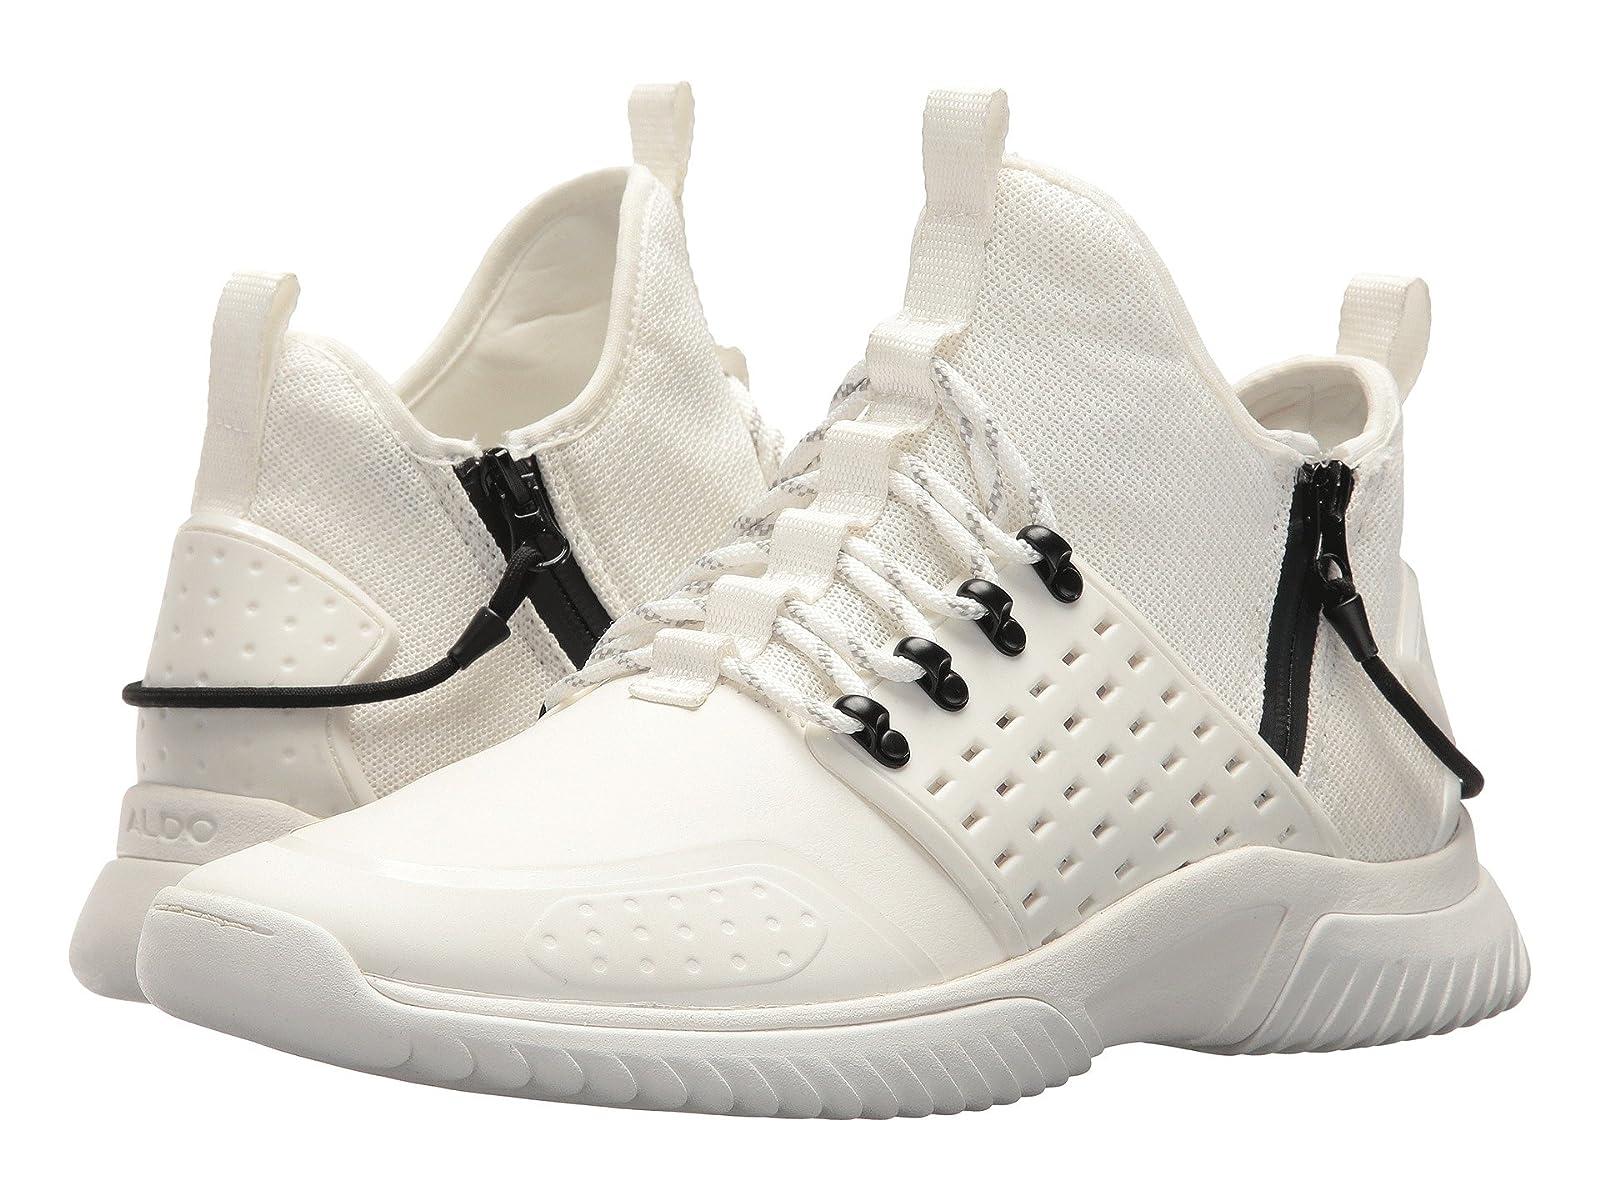 ALDO FrealiaAtmospheric grades have affordable shoes